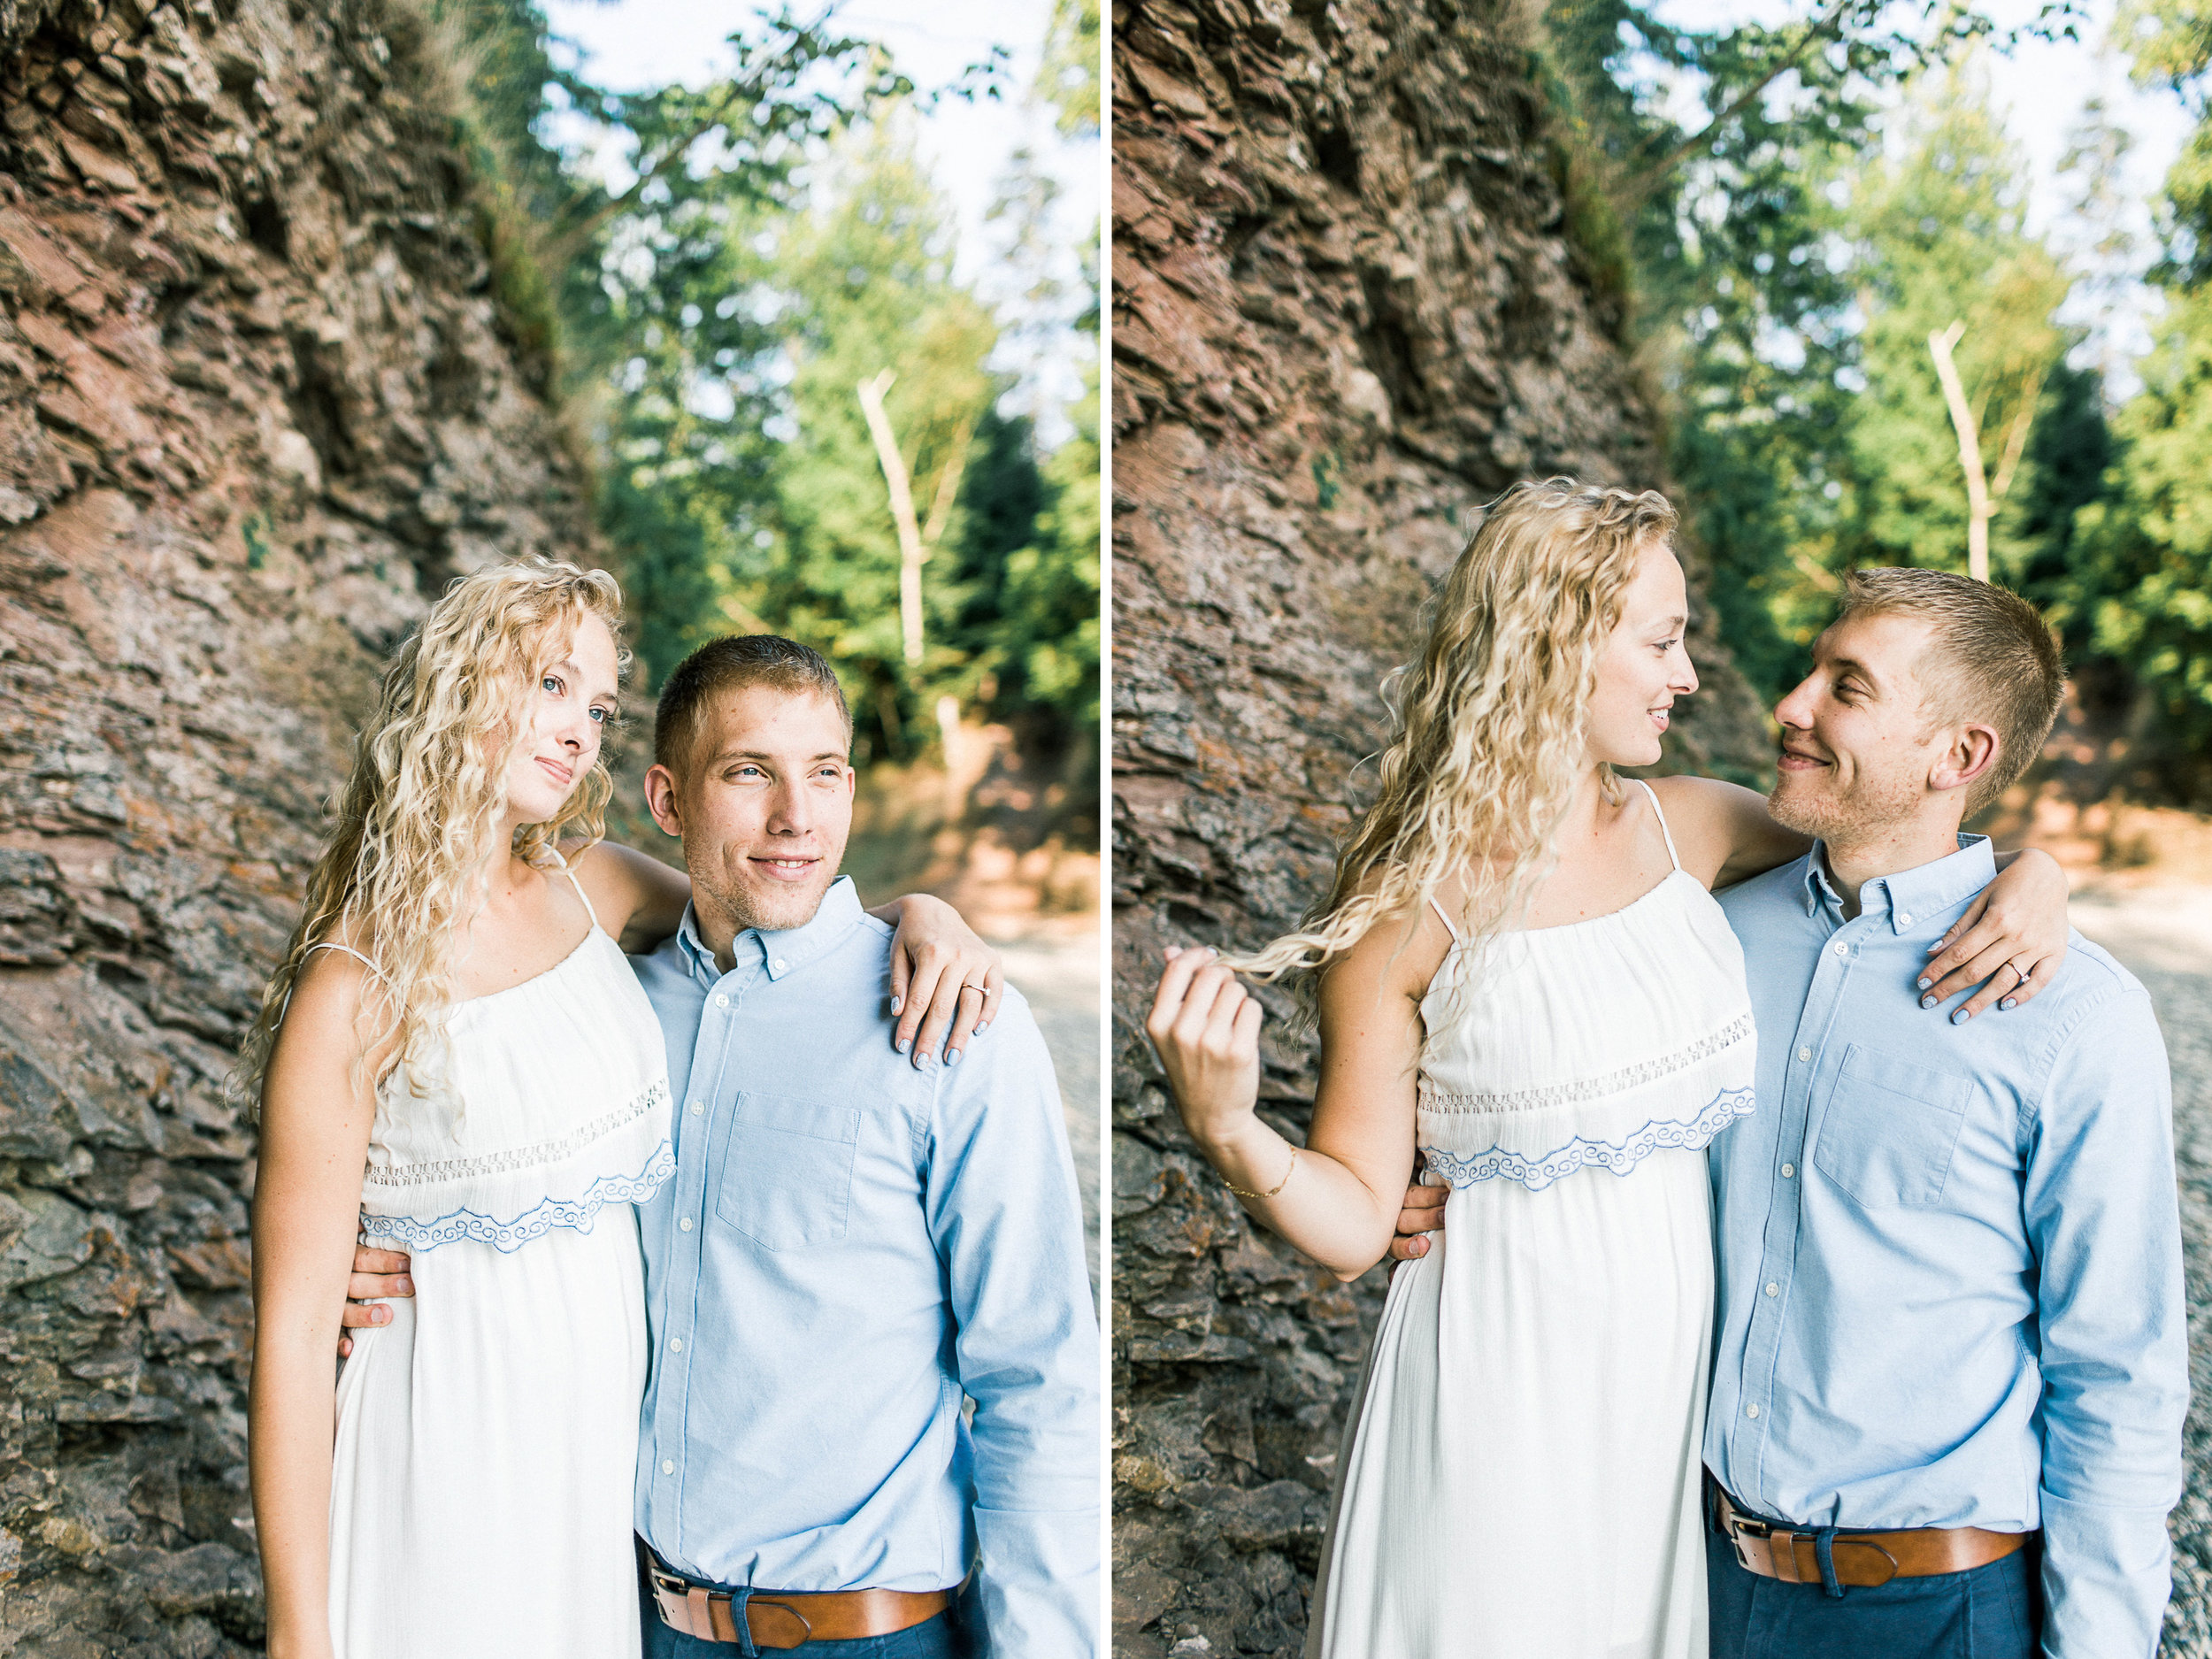 Northern Michigan Engagement Photographer - Lauren and Brent 039.jpg